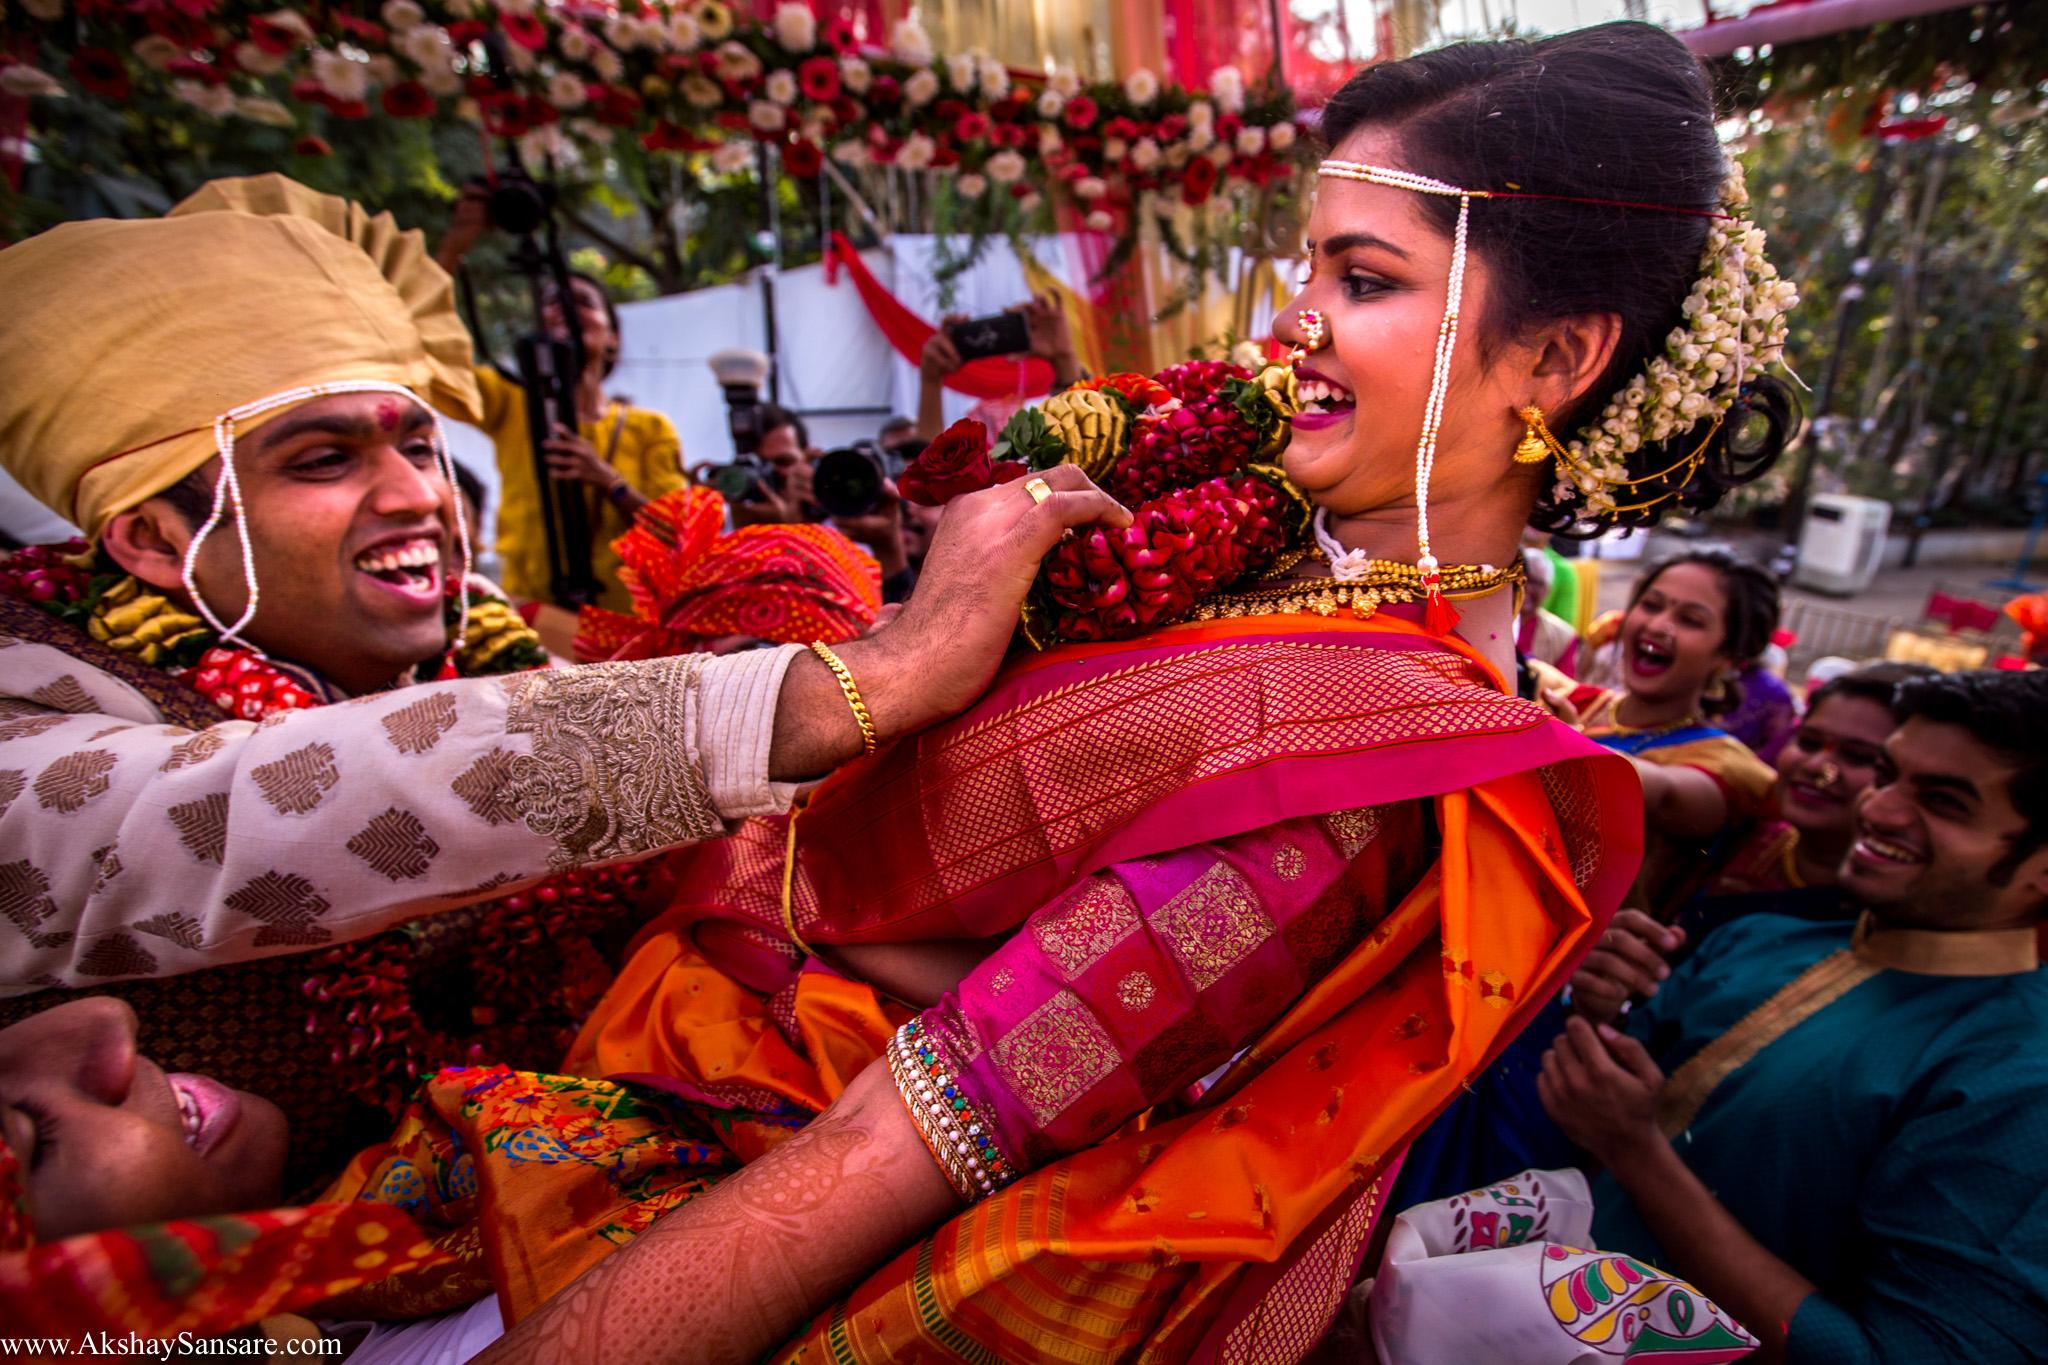 Salil x Kimaya Akshay Sansare Photography Candid wedding Photographer in mumbai best(34).jpg